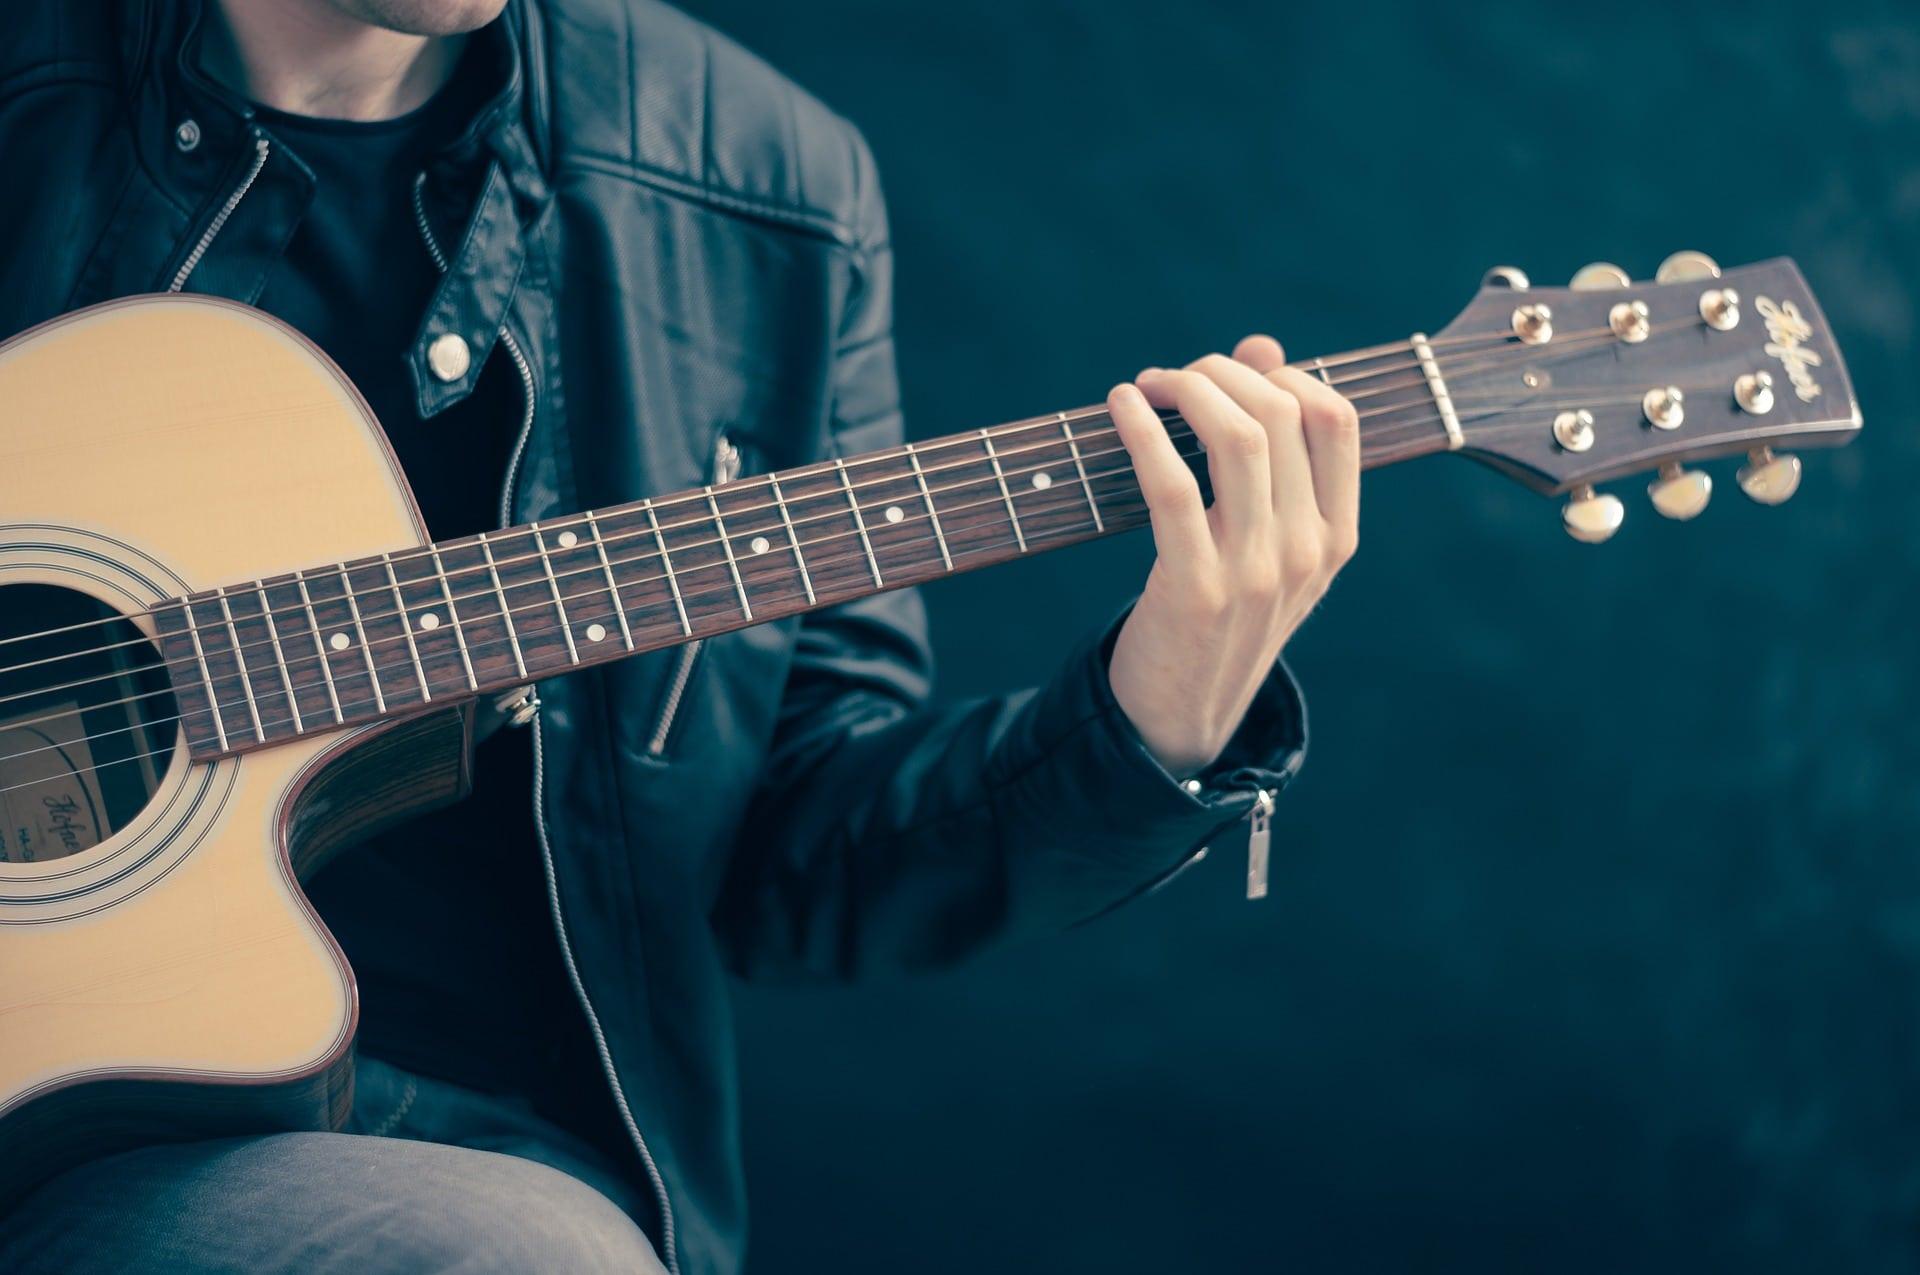 Musical Instruments - Guitar